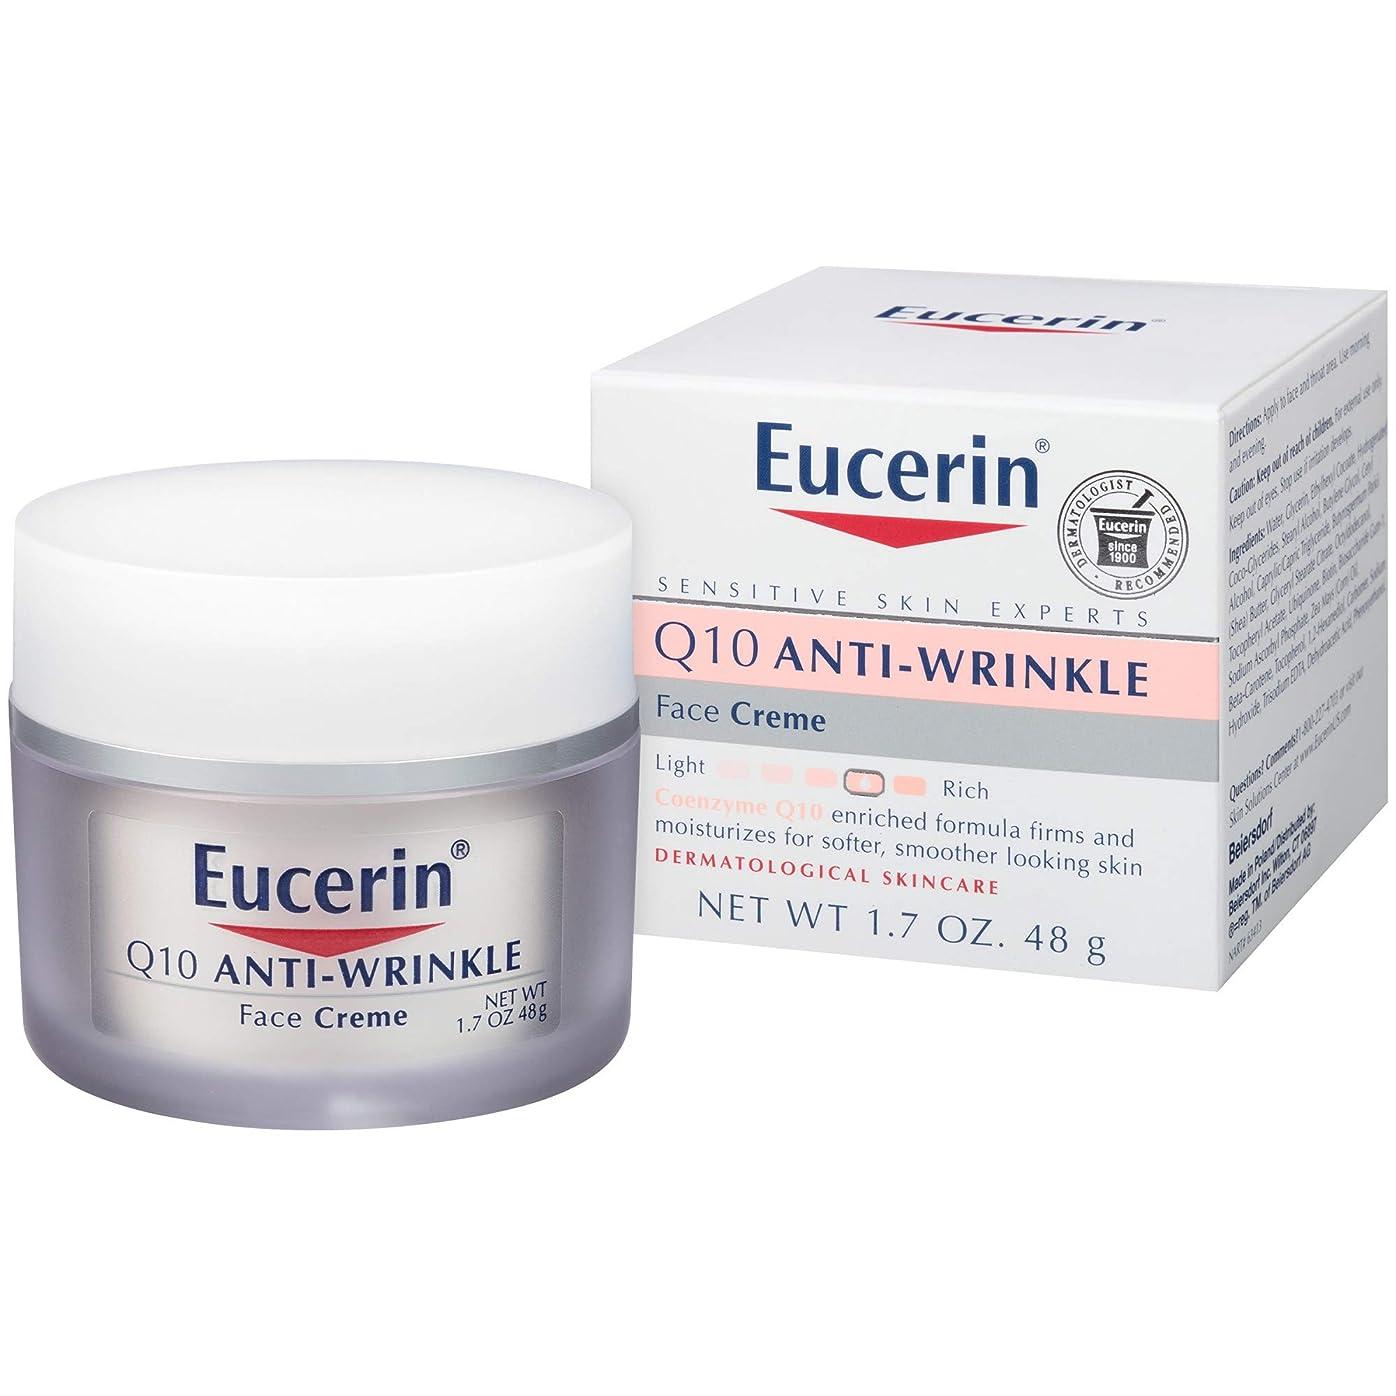 悪因子毎月寄託Eucerin Sensitive Facial Skin Q10 Anti-Wrinkle Sensitive Skin Creme 48g (並行輸入品)